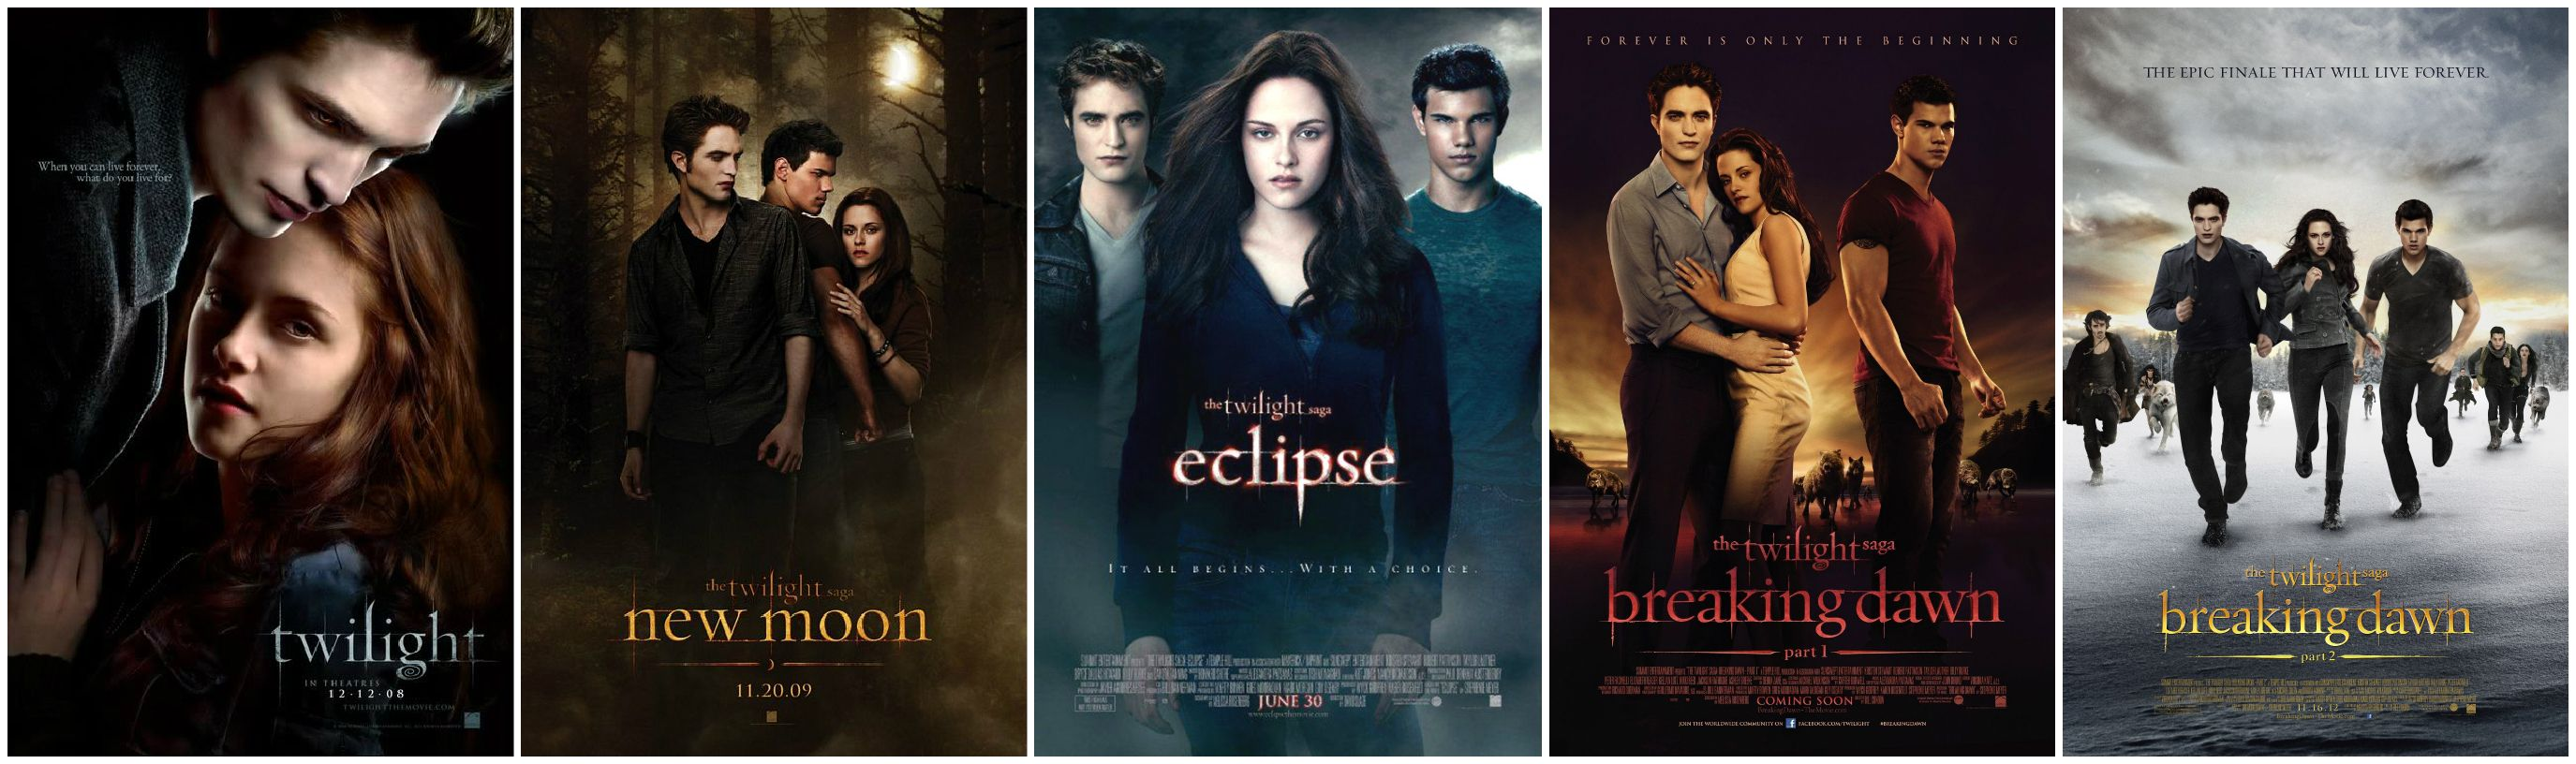 Twilight (2008), New Moon(2009), Eclipse (2010), Breaking